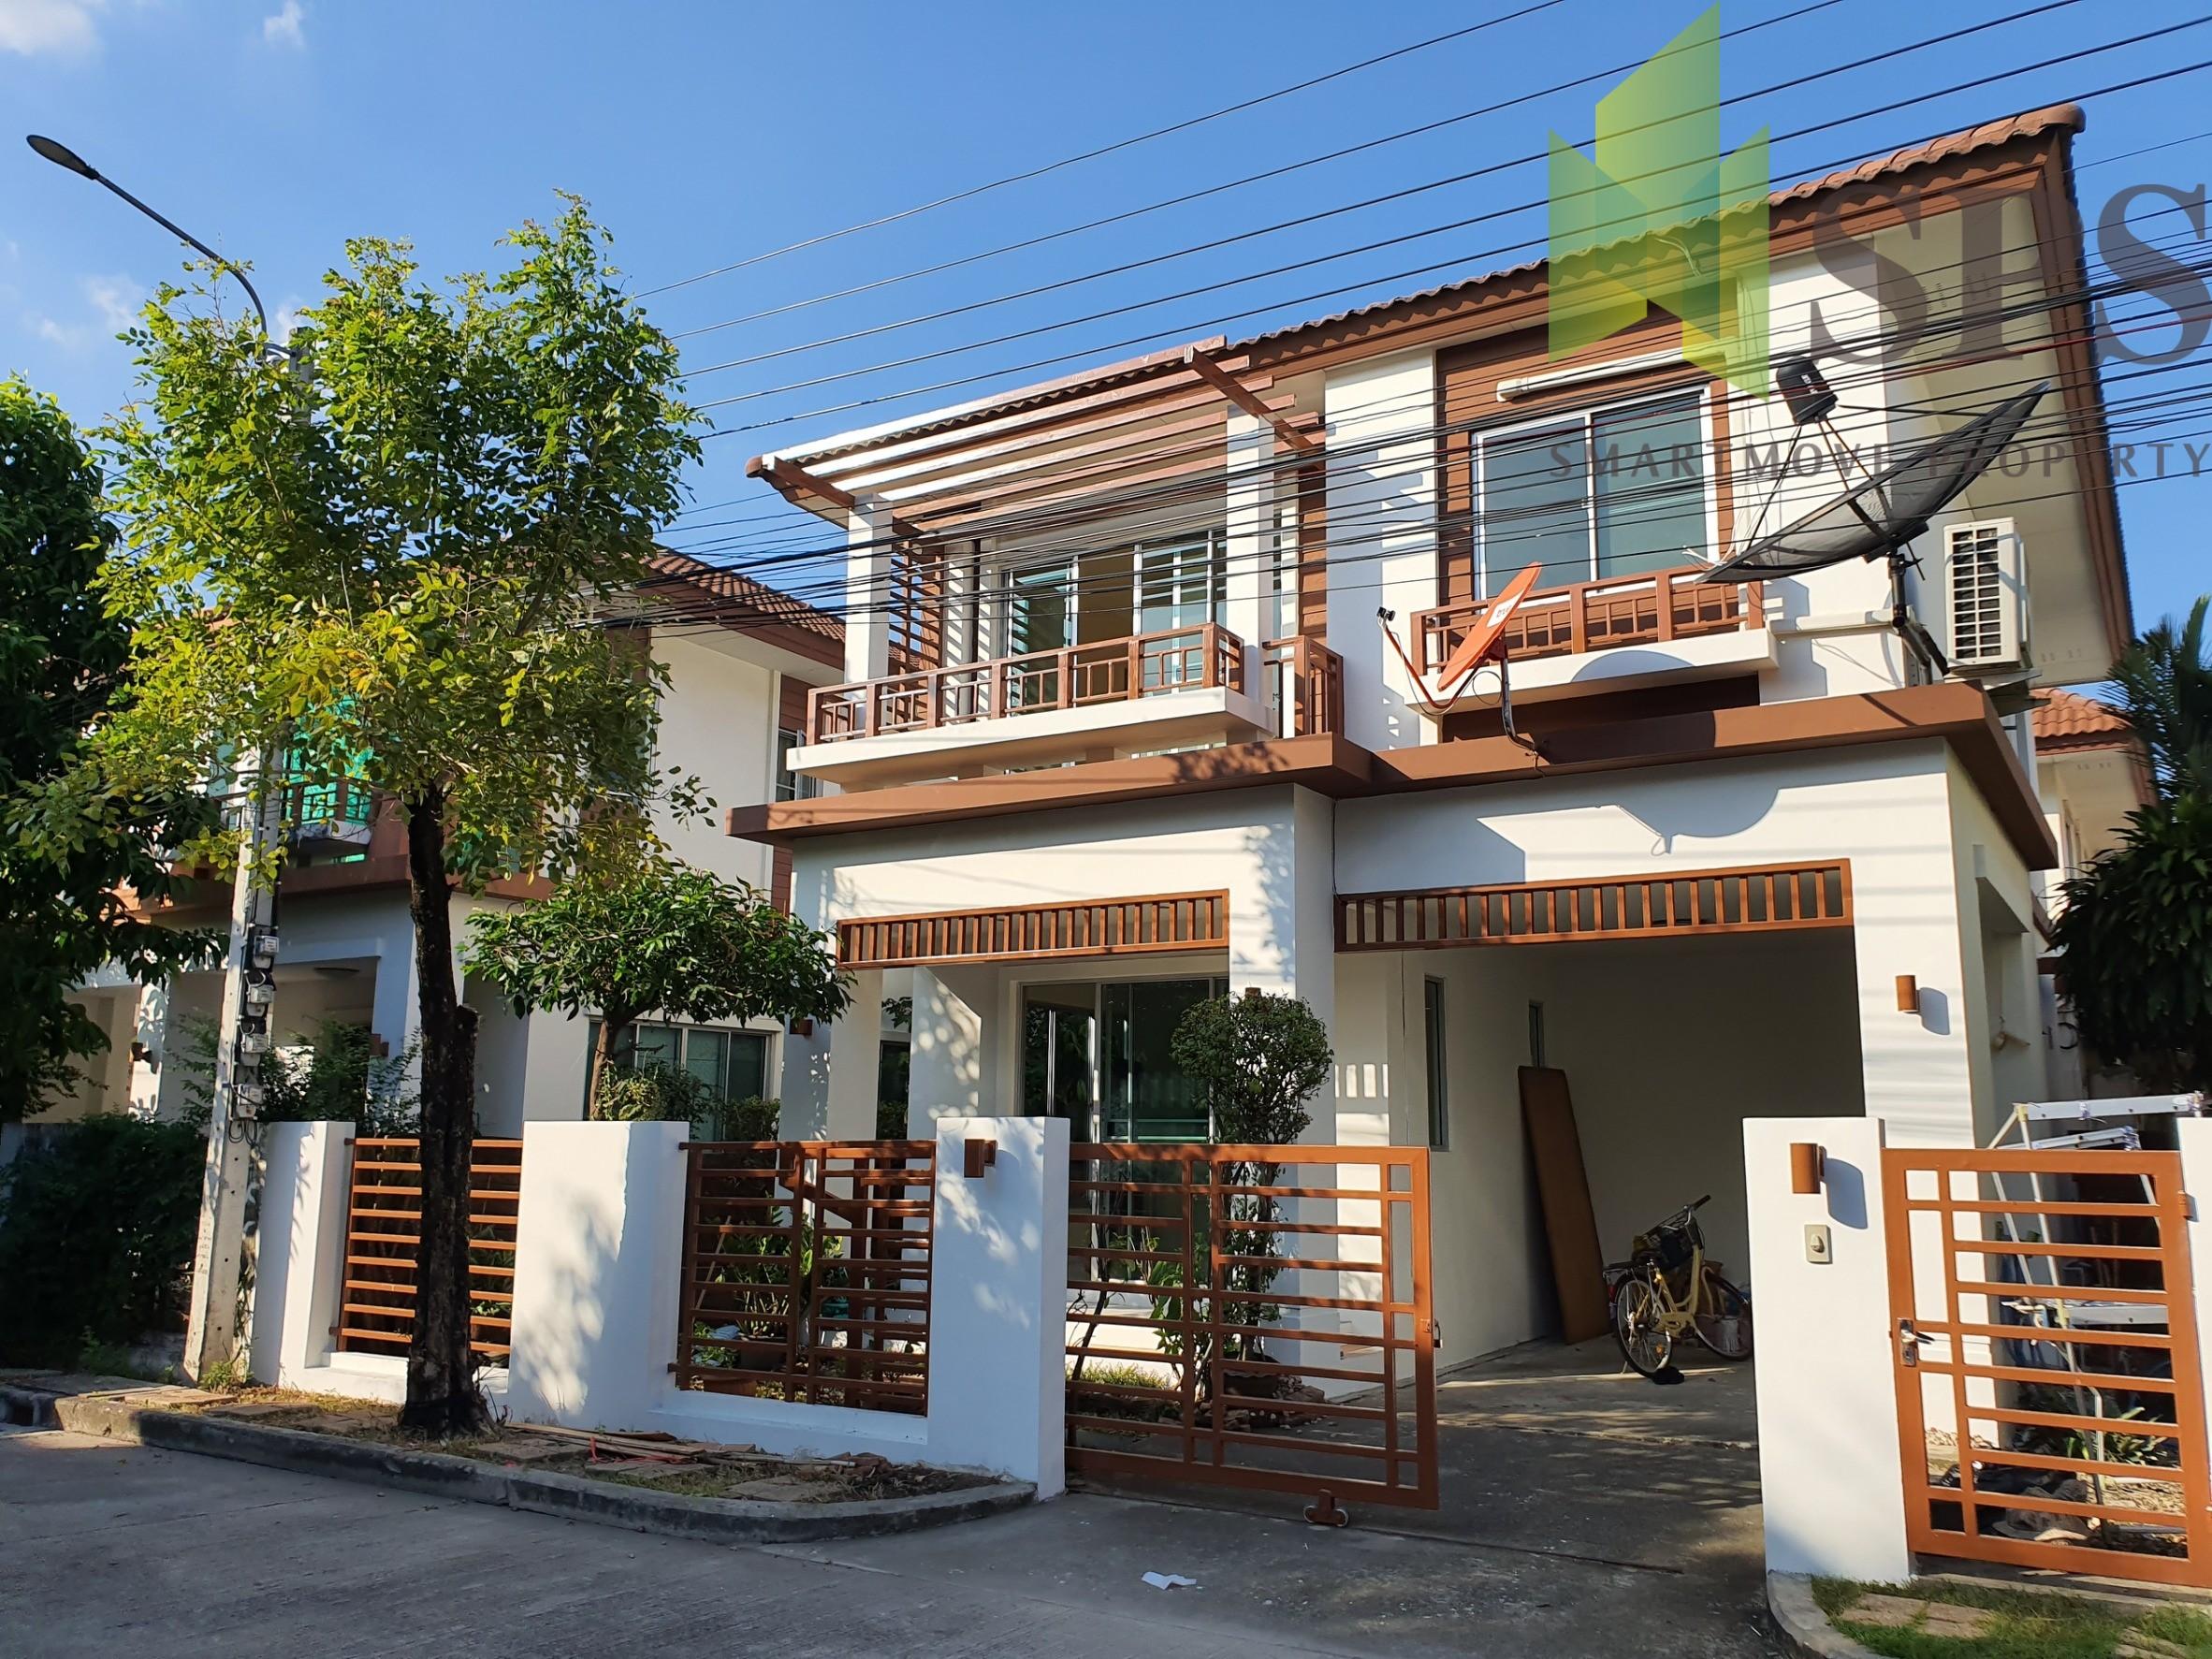 For Rent Single House หมู่บ้านมัลดีฟ ปาล์ม – Atoll Maldives Palms Bangna-Trad Km. 8( SPSPE308)